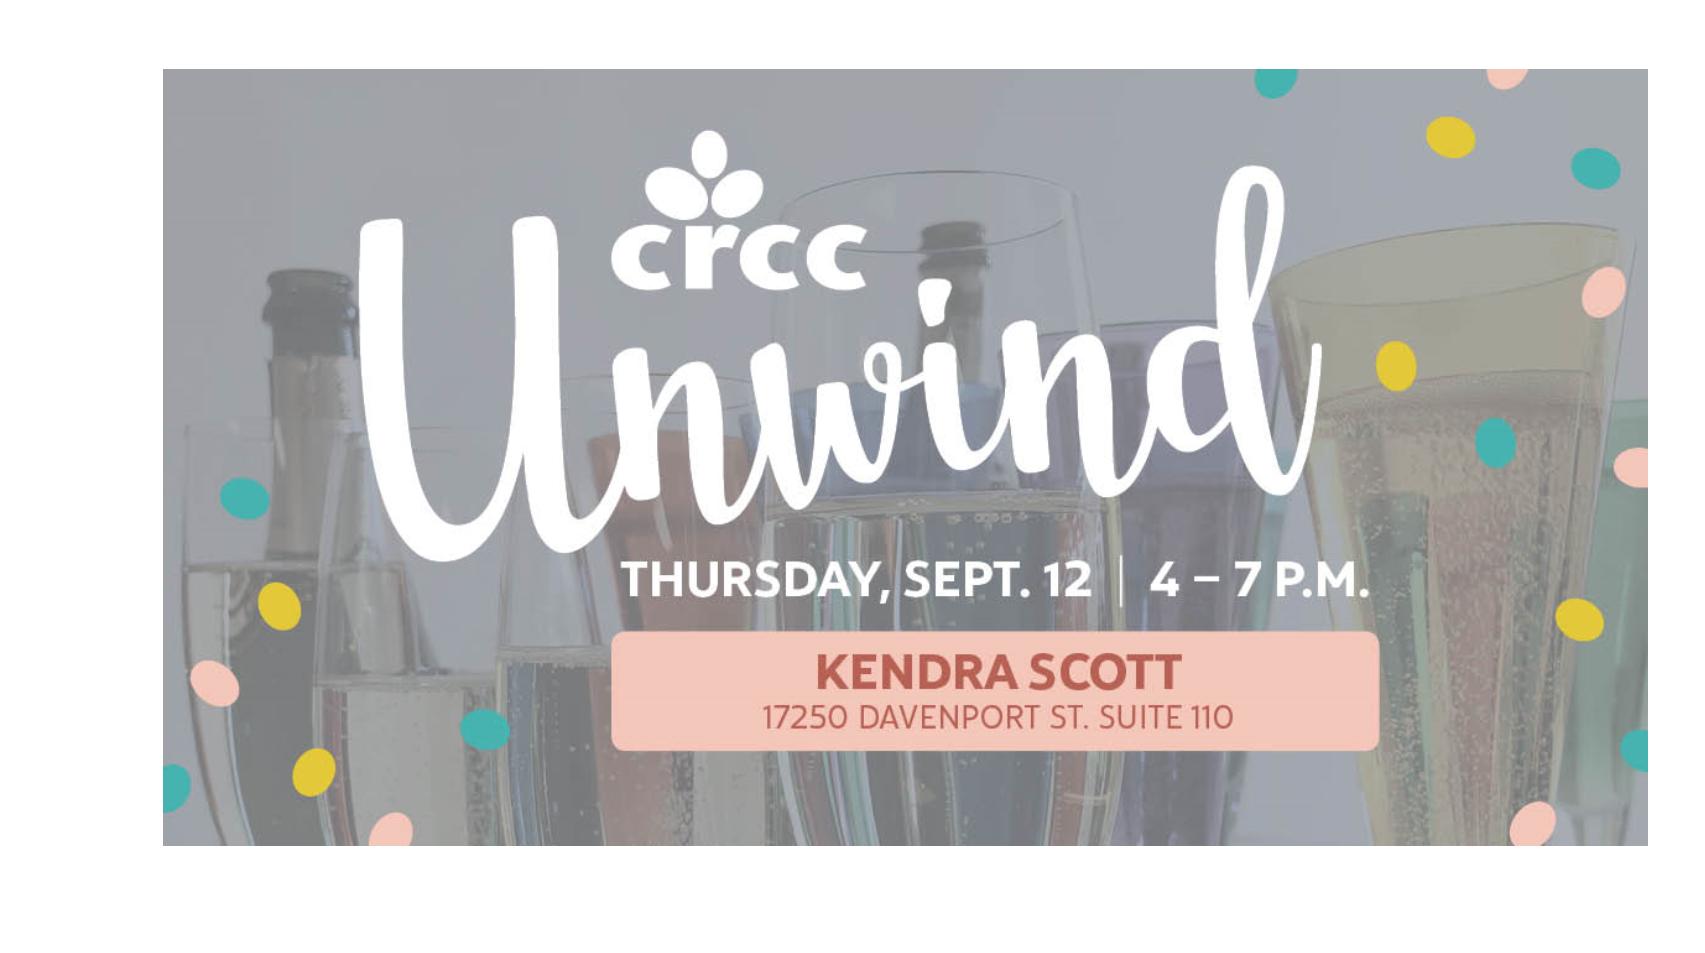 CRCC Unwind